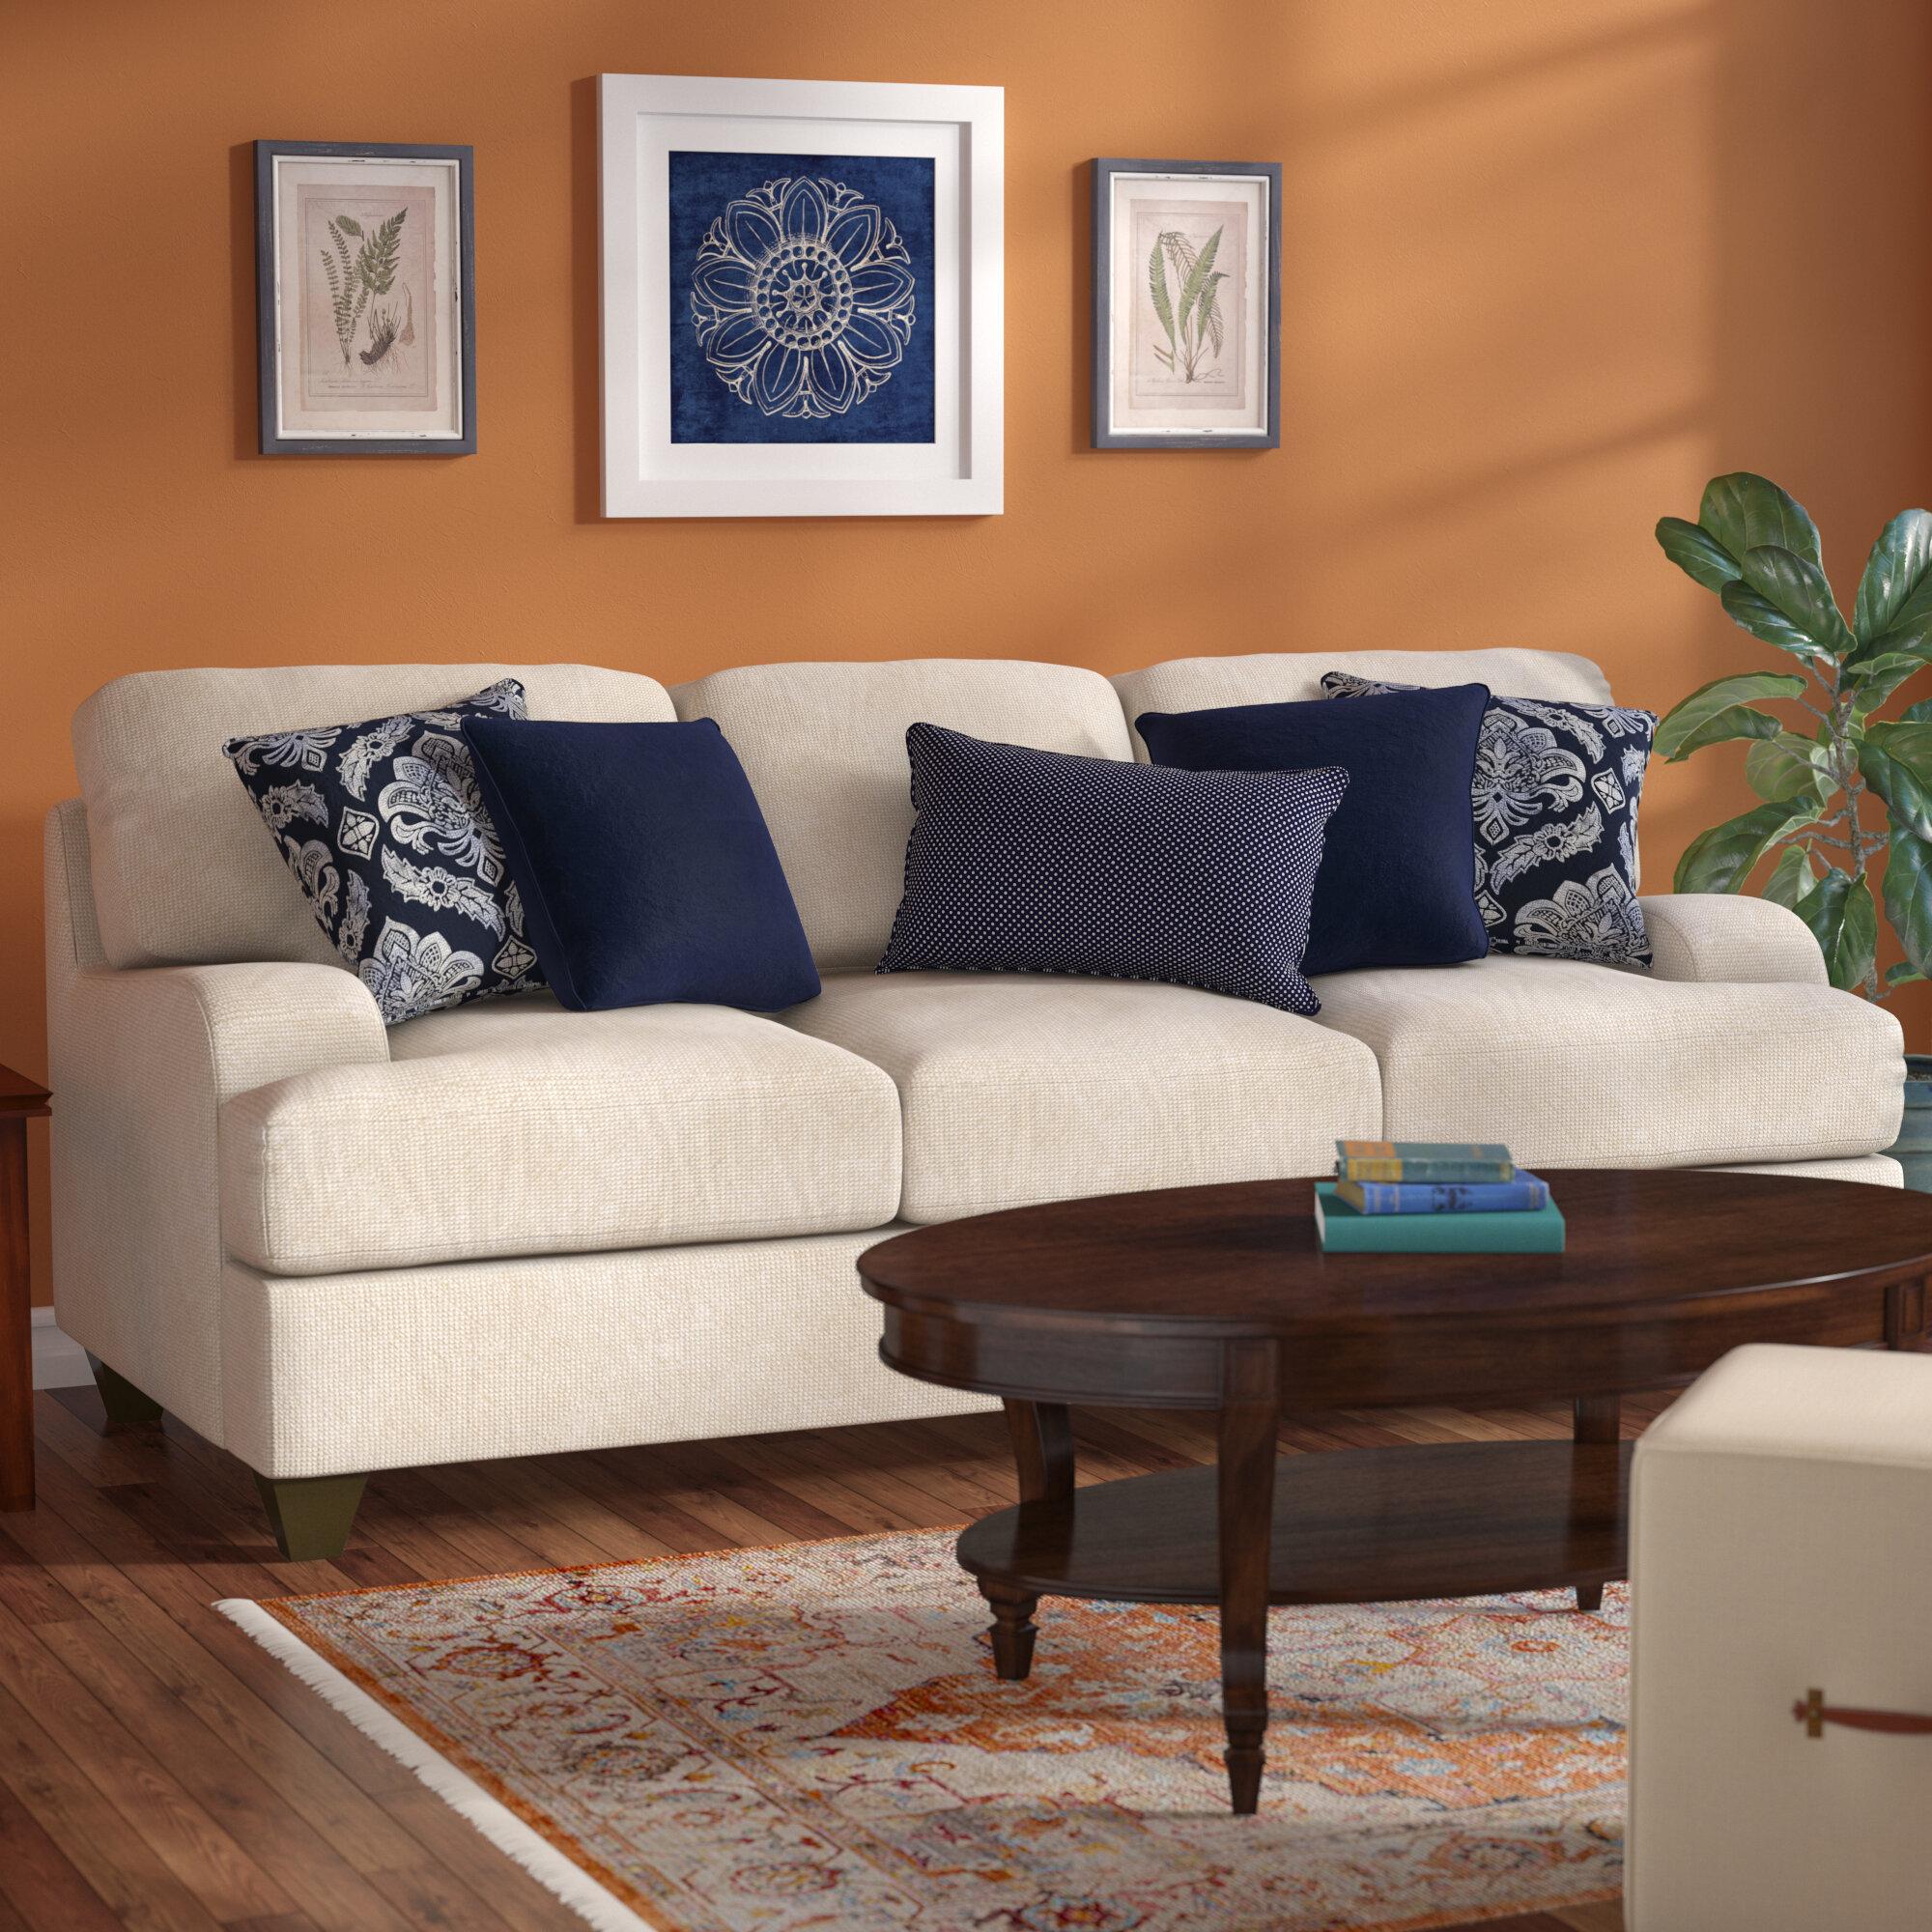 Three Posts Simmons Upholstery Hattiesburg Stone Queen Sofa Bed ...